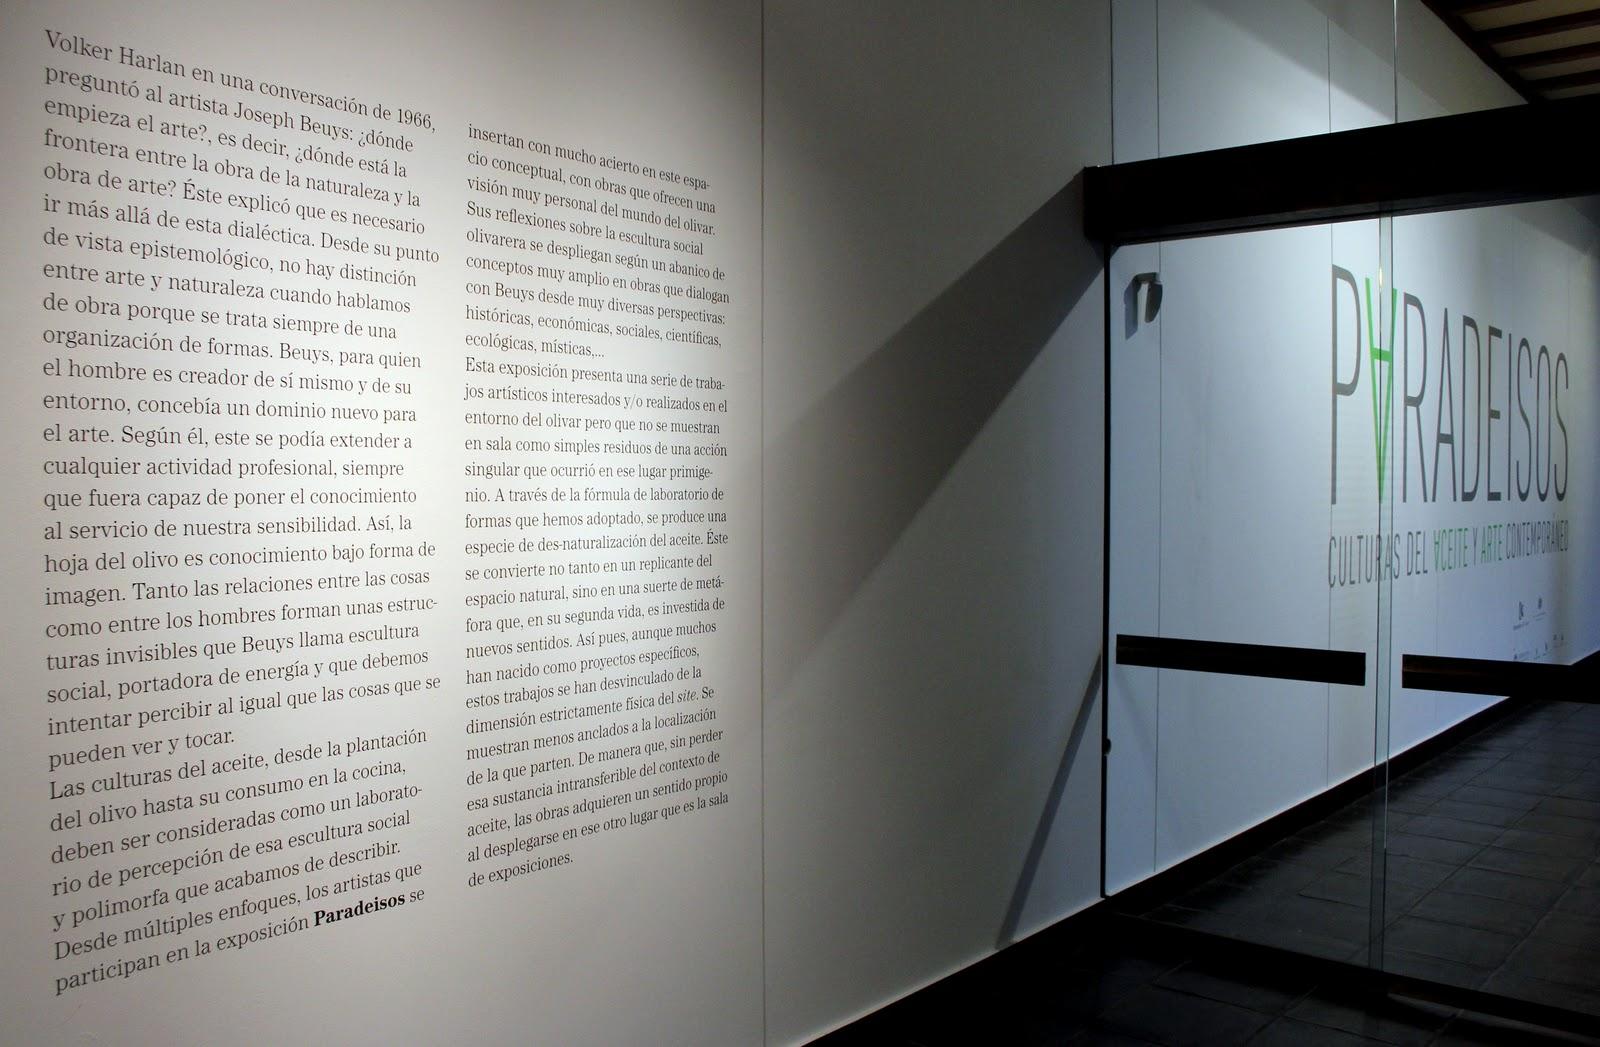 Rural Contemporanea Paradeisos Oil Cultures And Contemporary Art